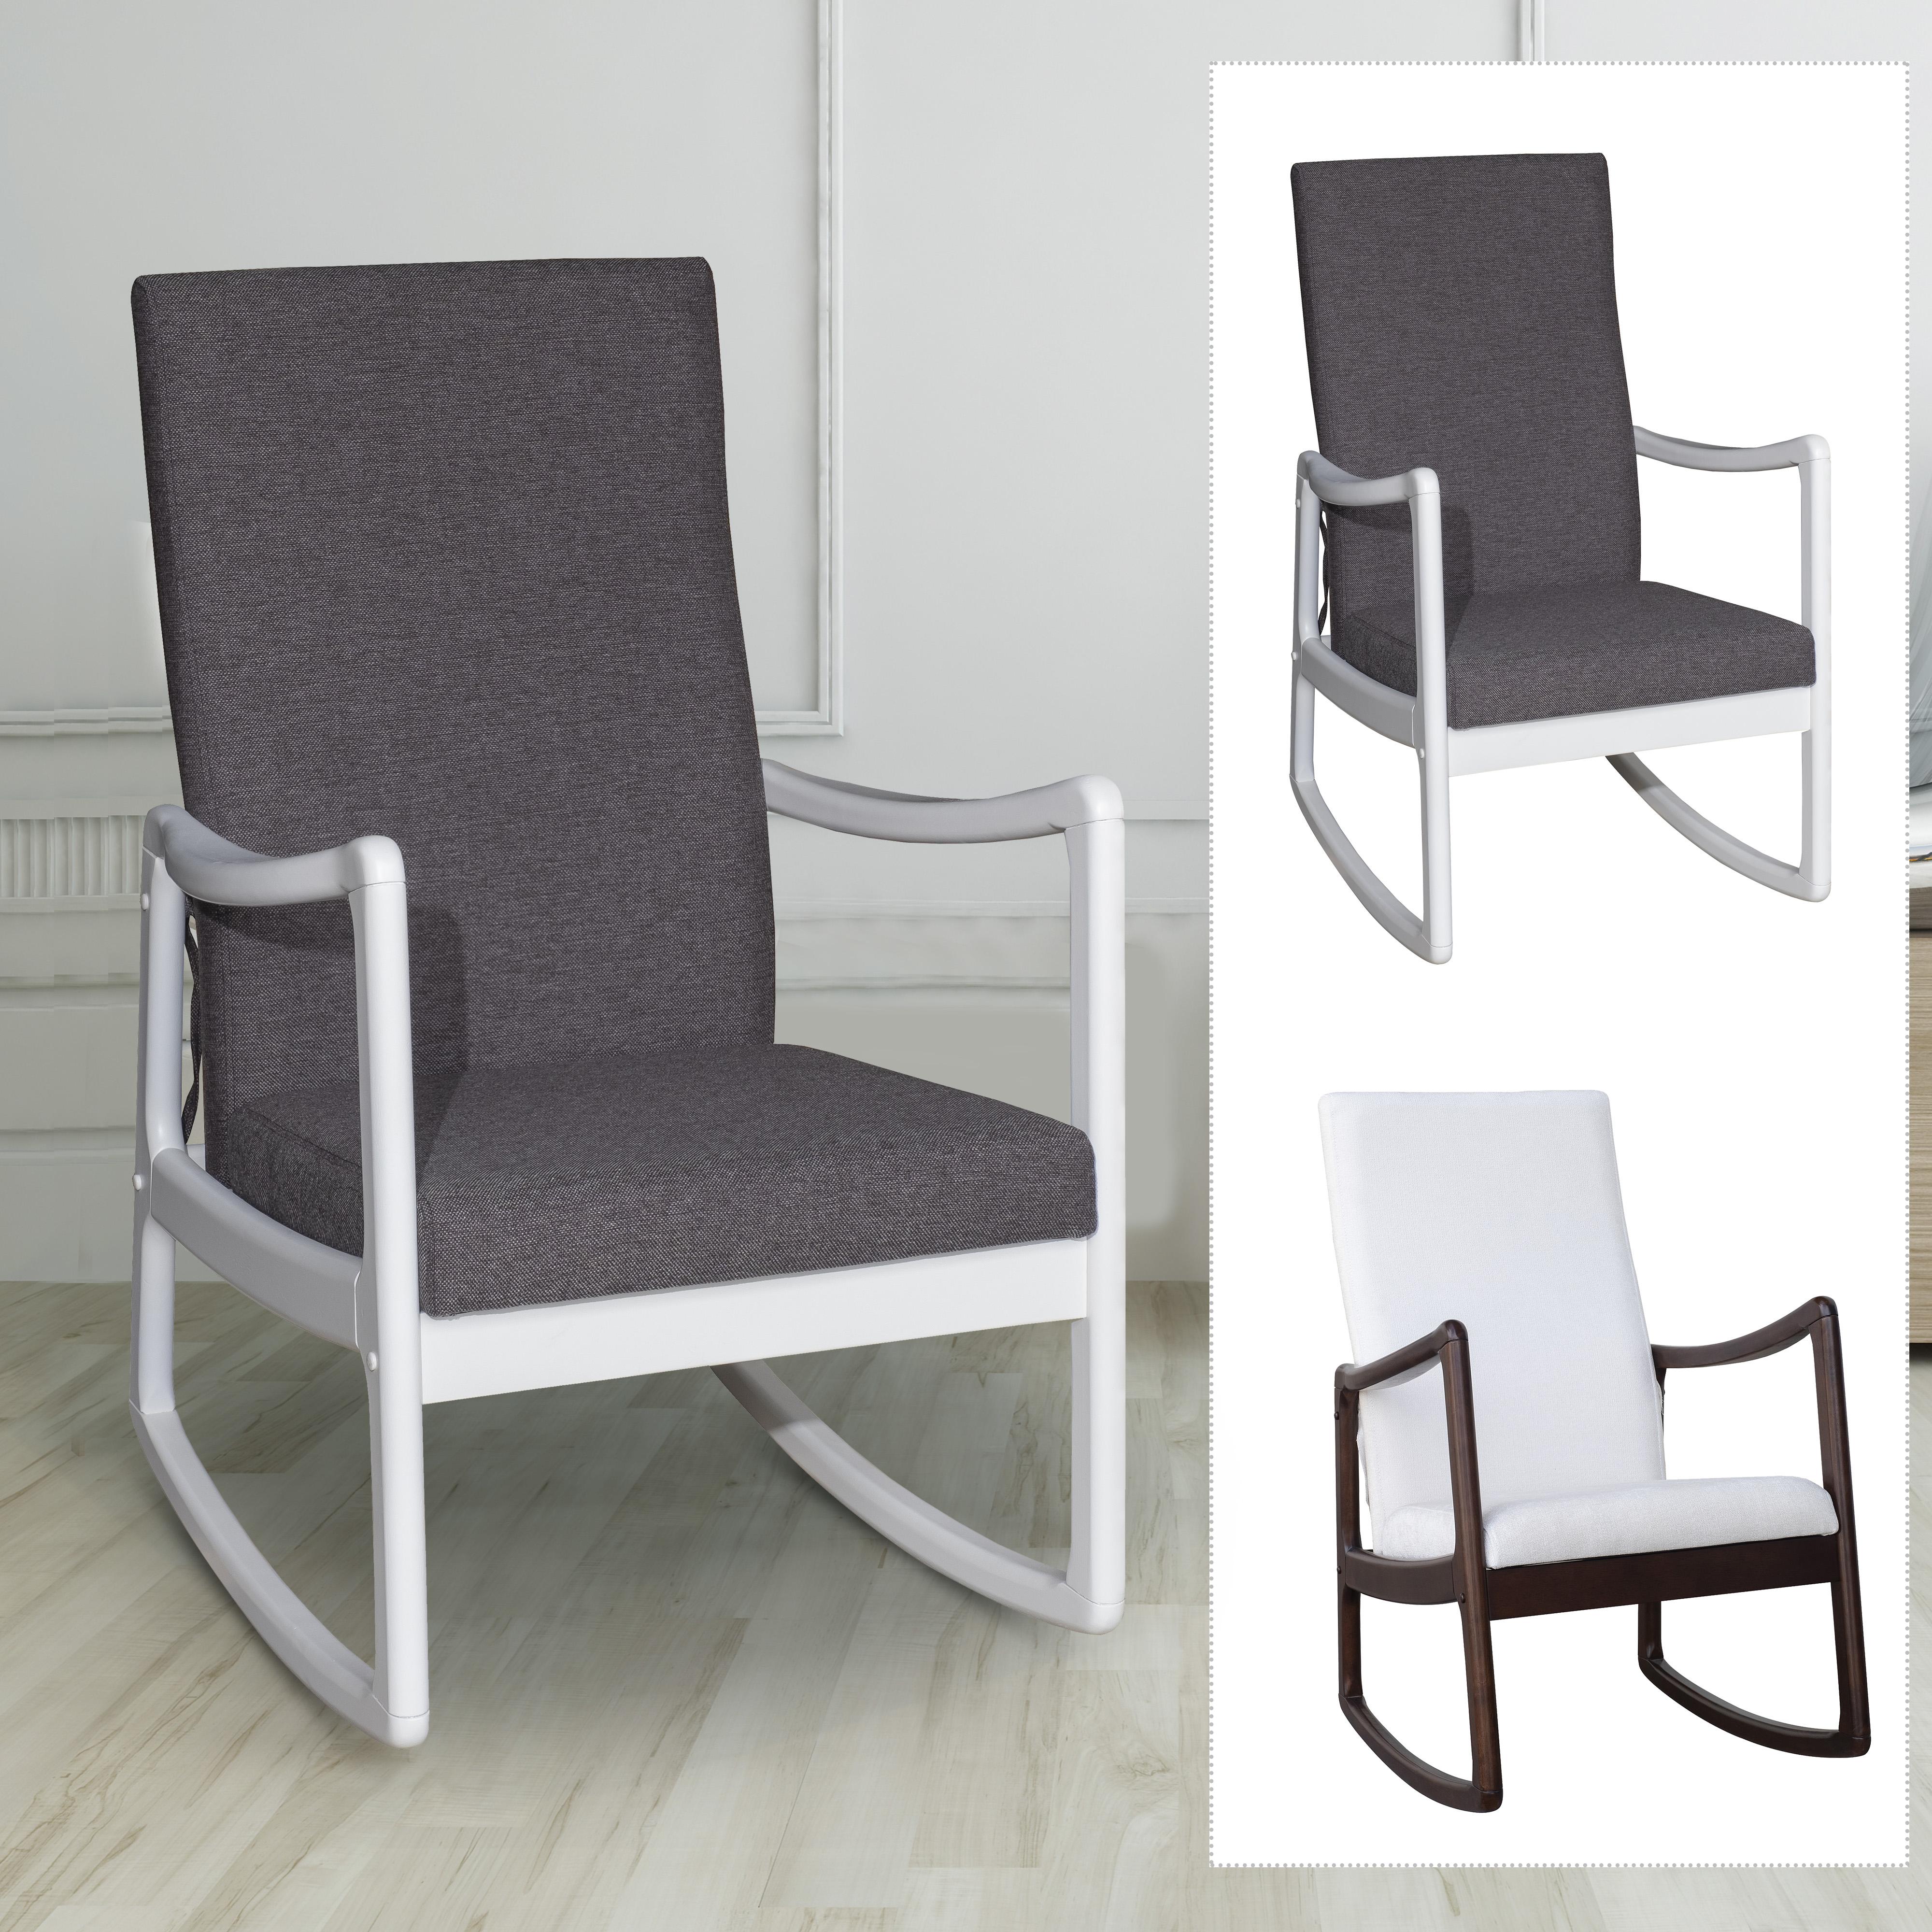 Brilliant Details About Modern Wood Rocking Chair Indoor Porch Furniture Padded Rocker Living Room Seat Download Free Architecture Designs Scobabritishbridgeorg